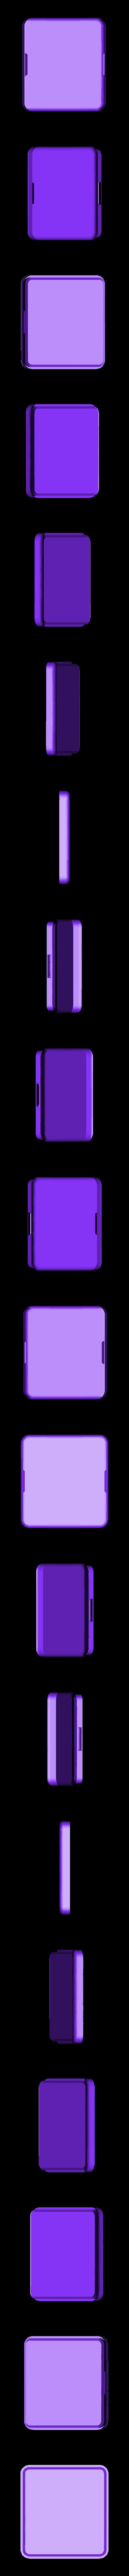 CSS-top-blank.stl Download free STL file Hand Crank Solder Dispenser • 3D printable design, Adafruit